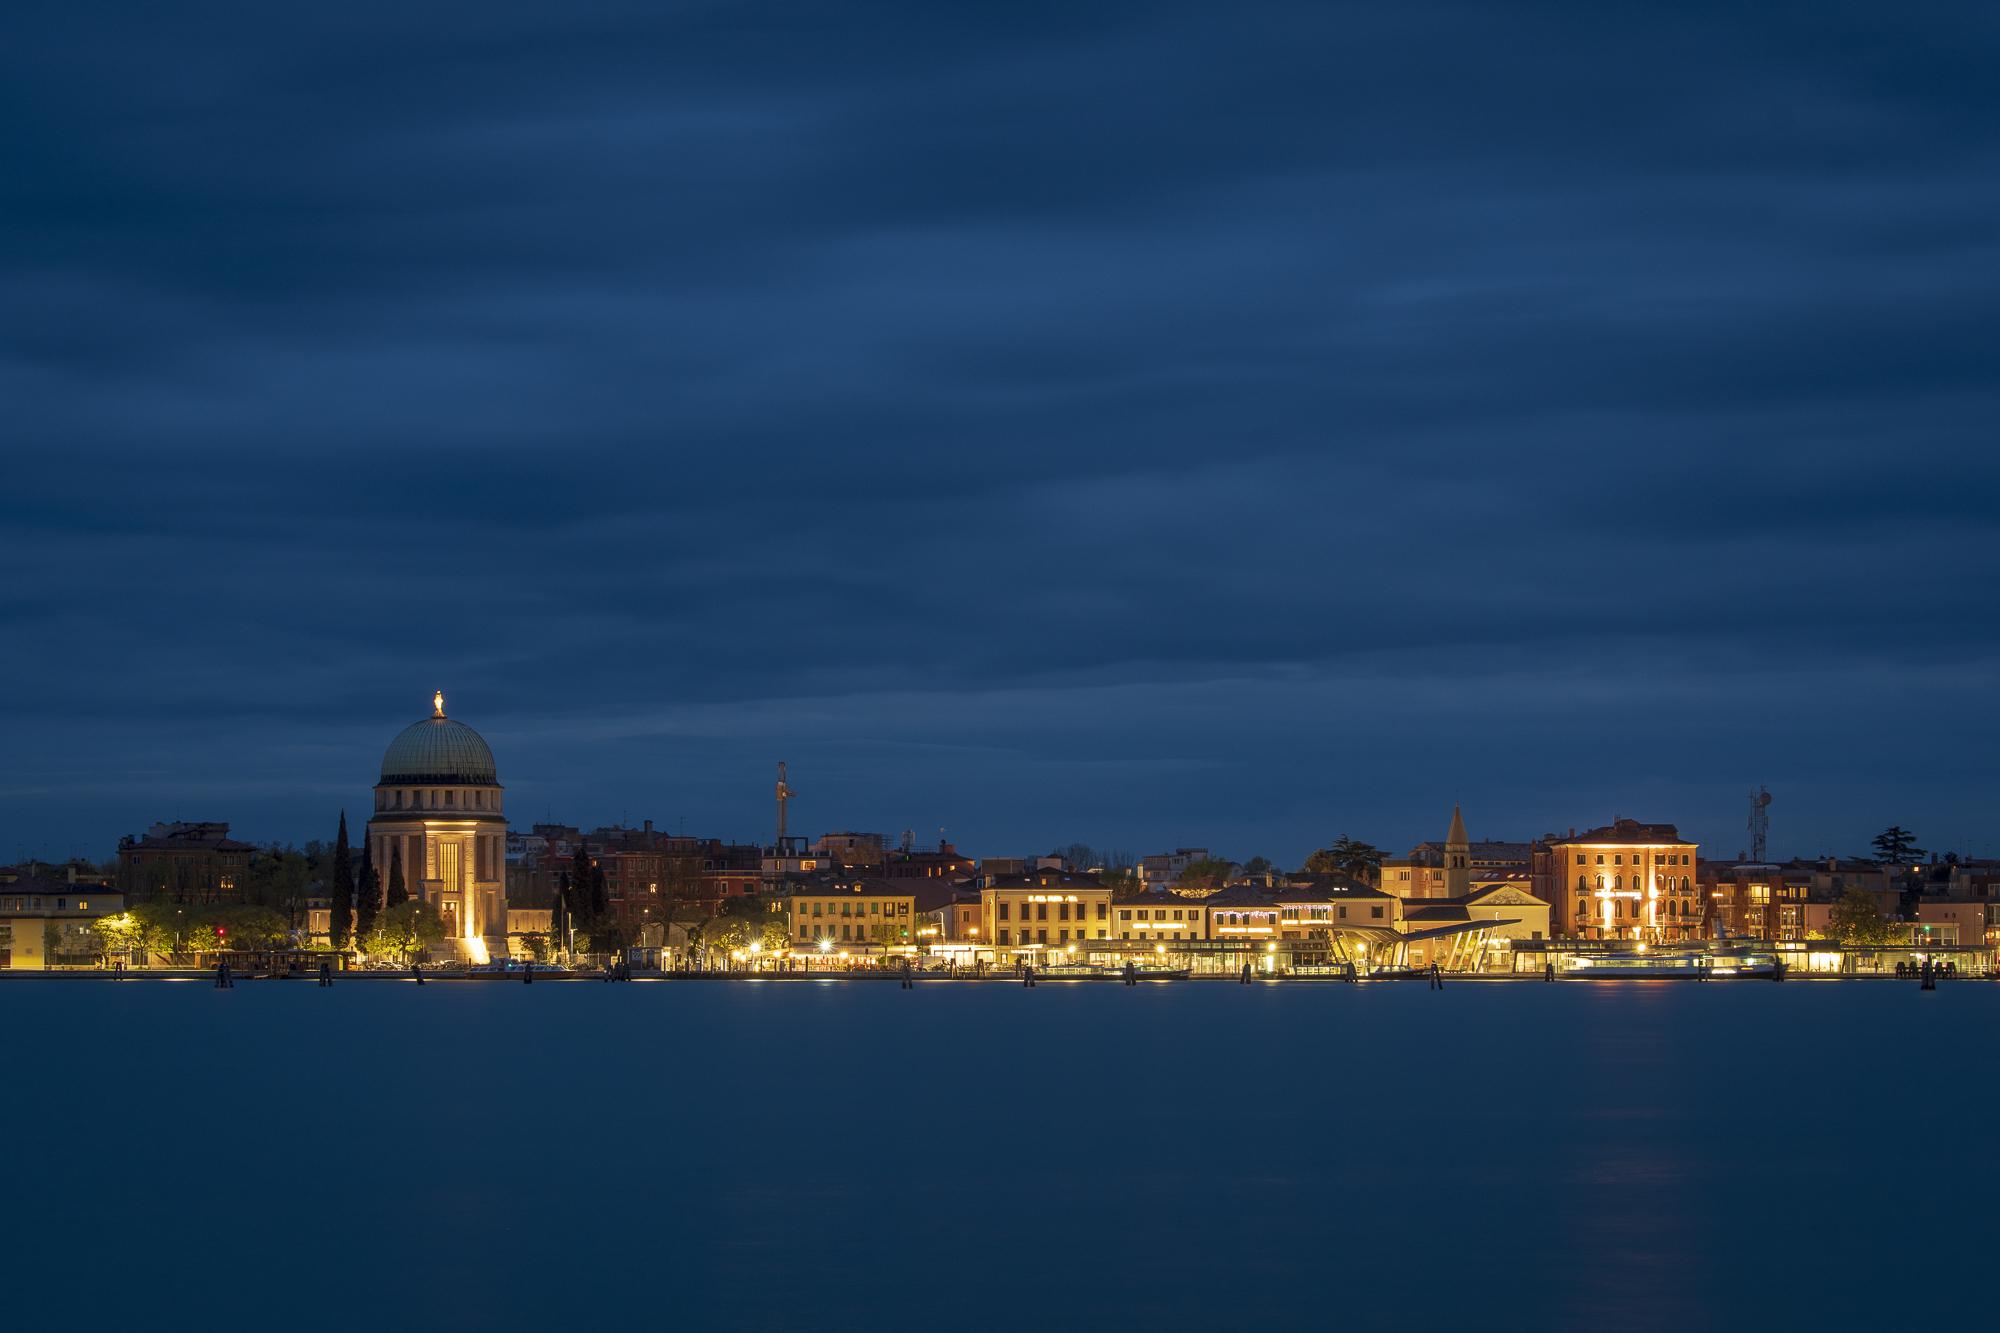 Lido di Venezia  PHOTOGRAPHY: ALEXANDER J.E. BRADLEY • NIKON D500 • AF-S NIKKOR 70-200mm ƒ/2.8 FL ED VR @ 75MM • Ƒ/8 • 15 SEC • ISO 100